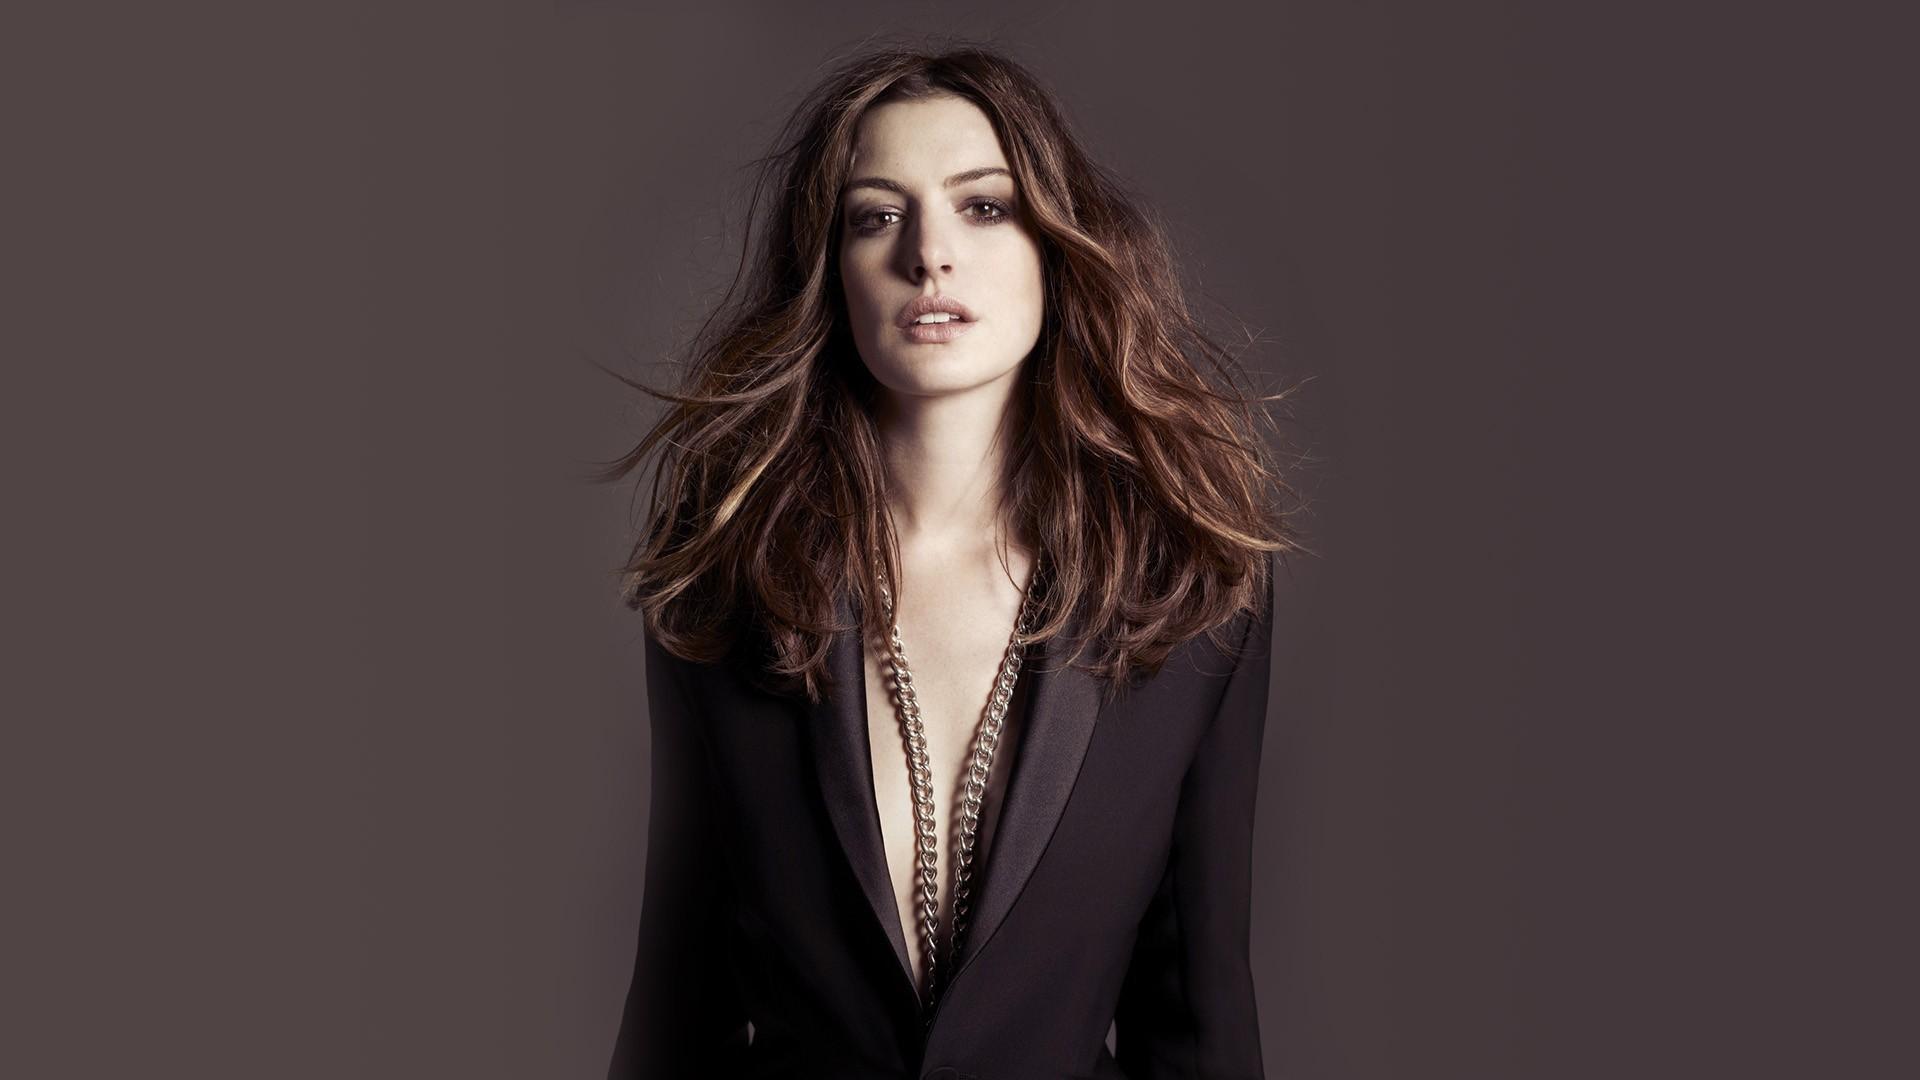 Anne Hathaway Hd Photos Wallpaper Hd Celebrities 4k